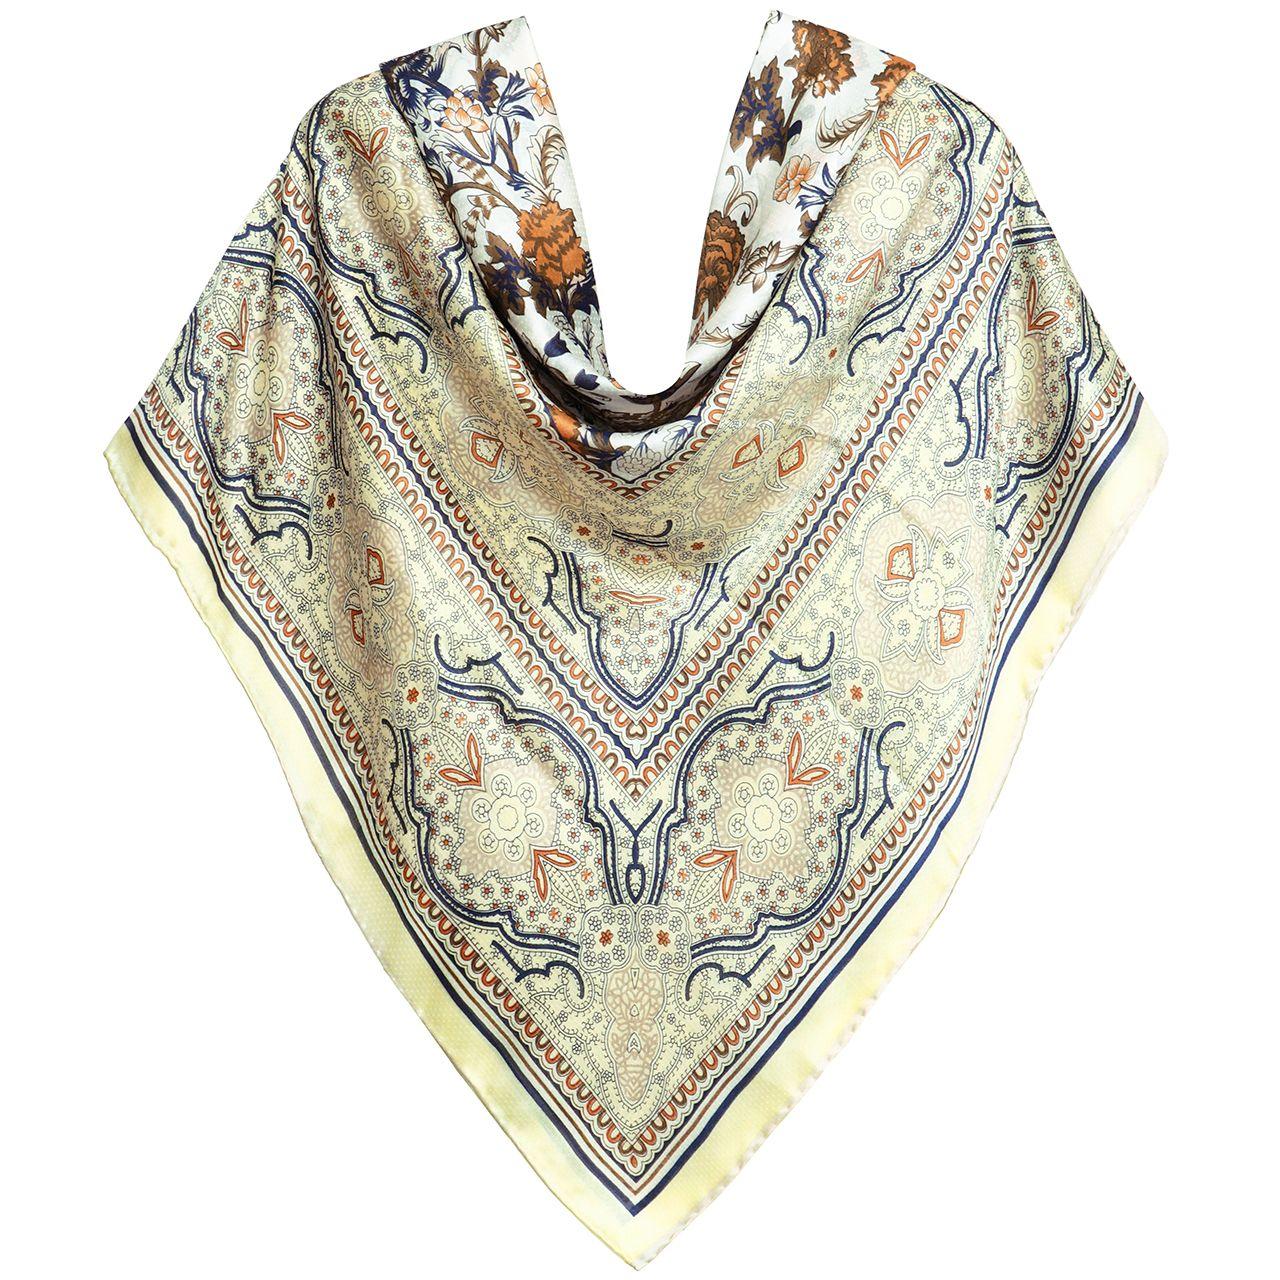 روسری زنانه کد Tp_44305-45 -  - 2